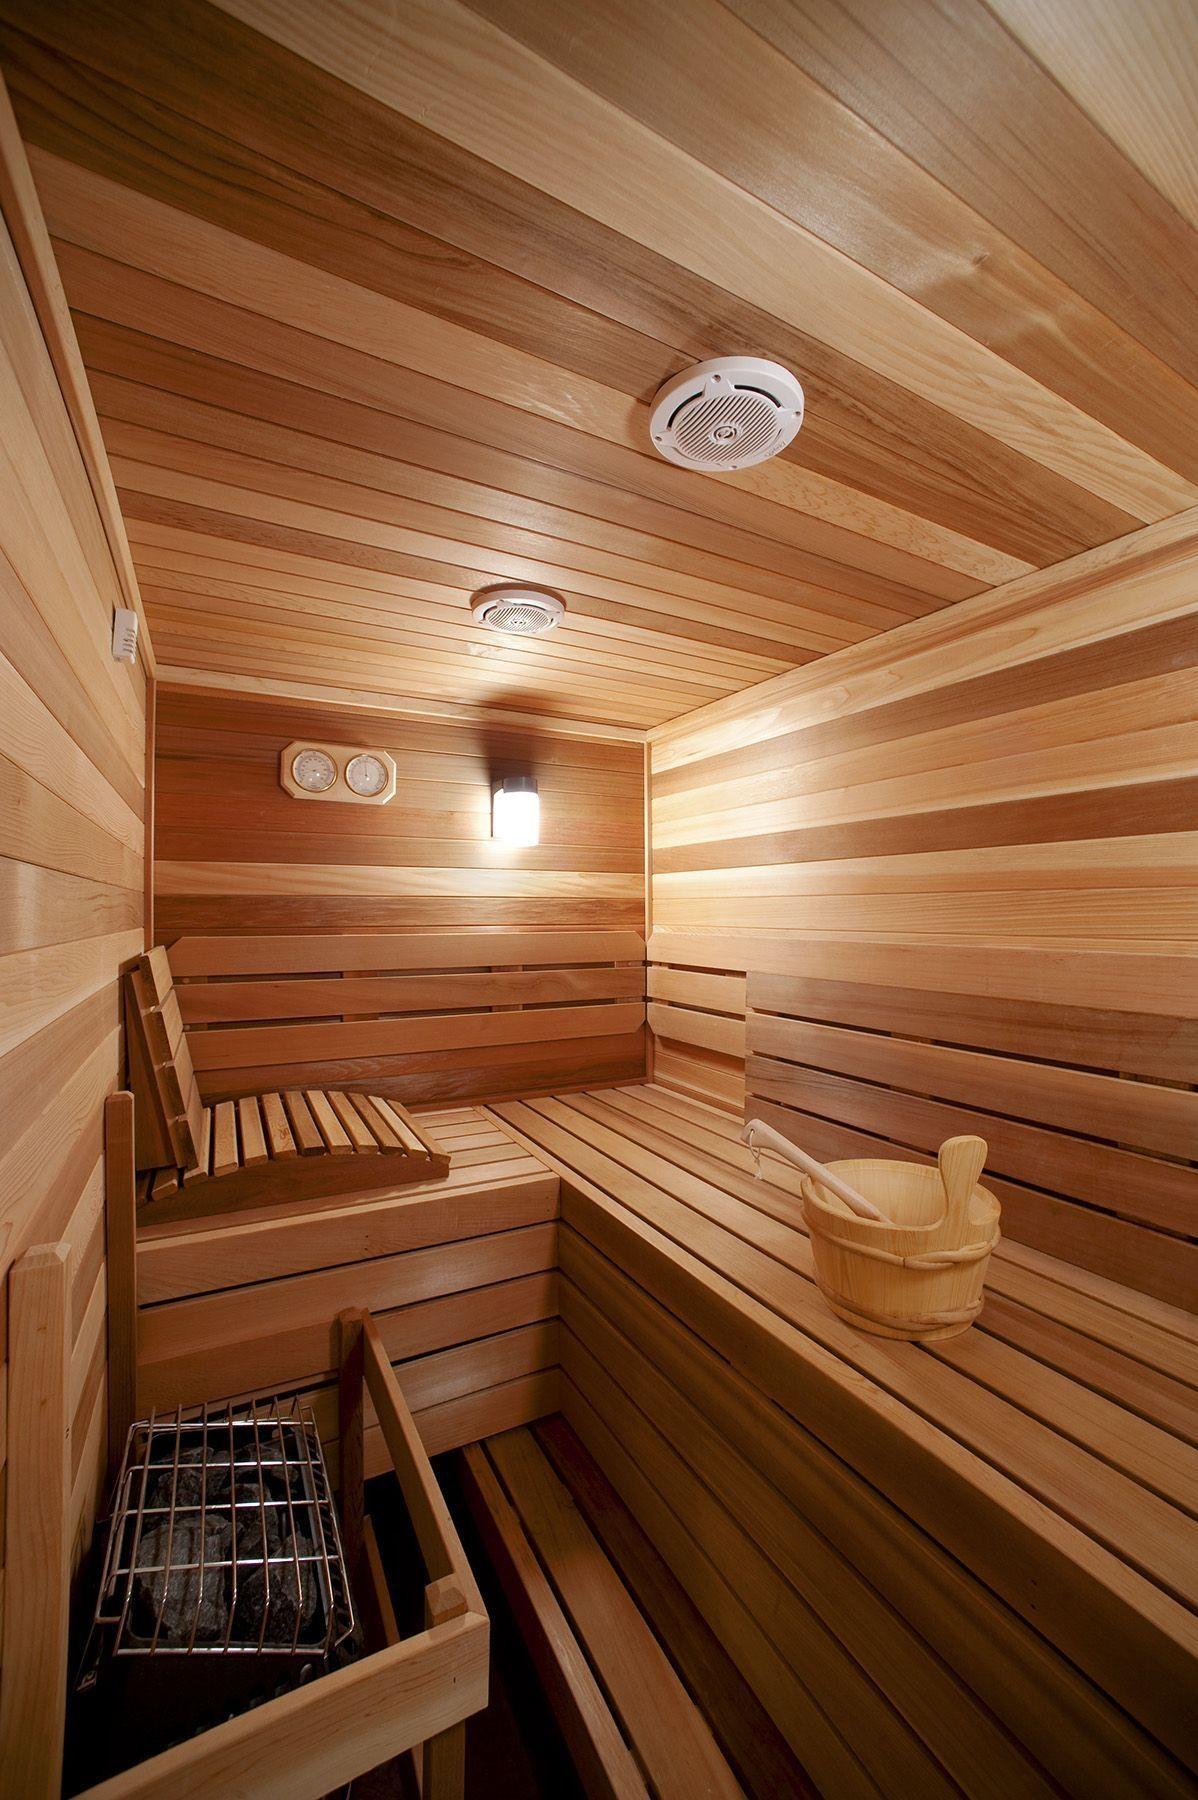 48 wonderful home sauna design ideas with images sauna